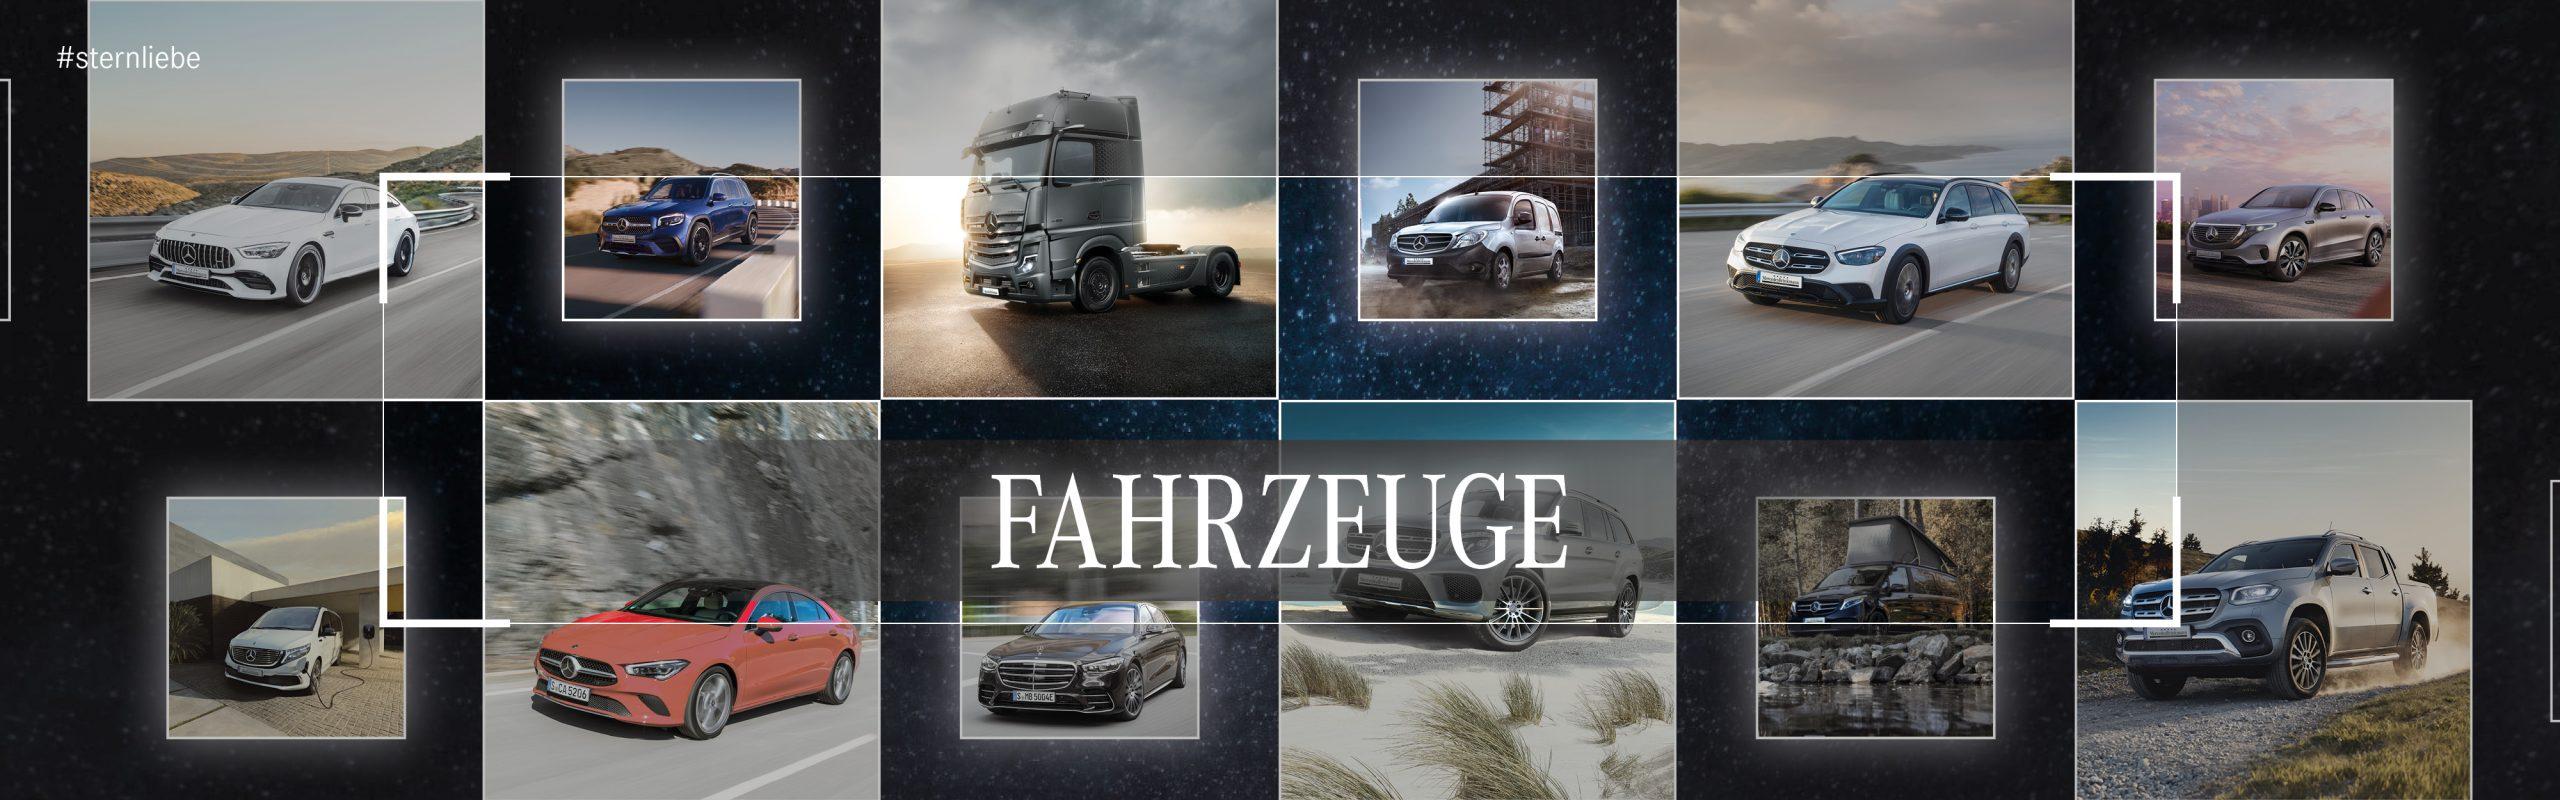 Banner-Fahrzeuge_Mercedes Benz Brinkmann